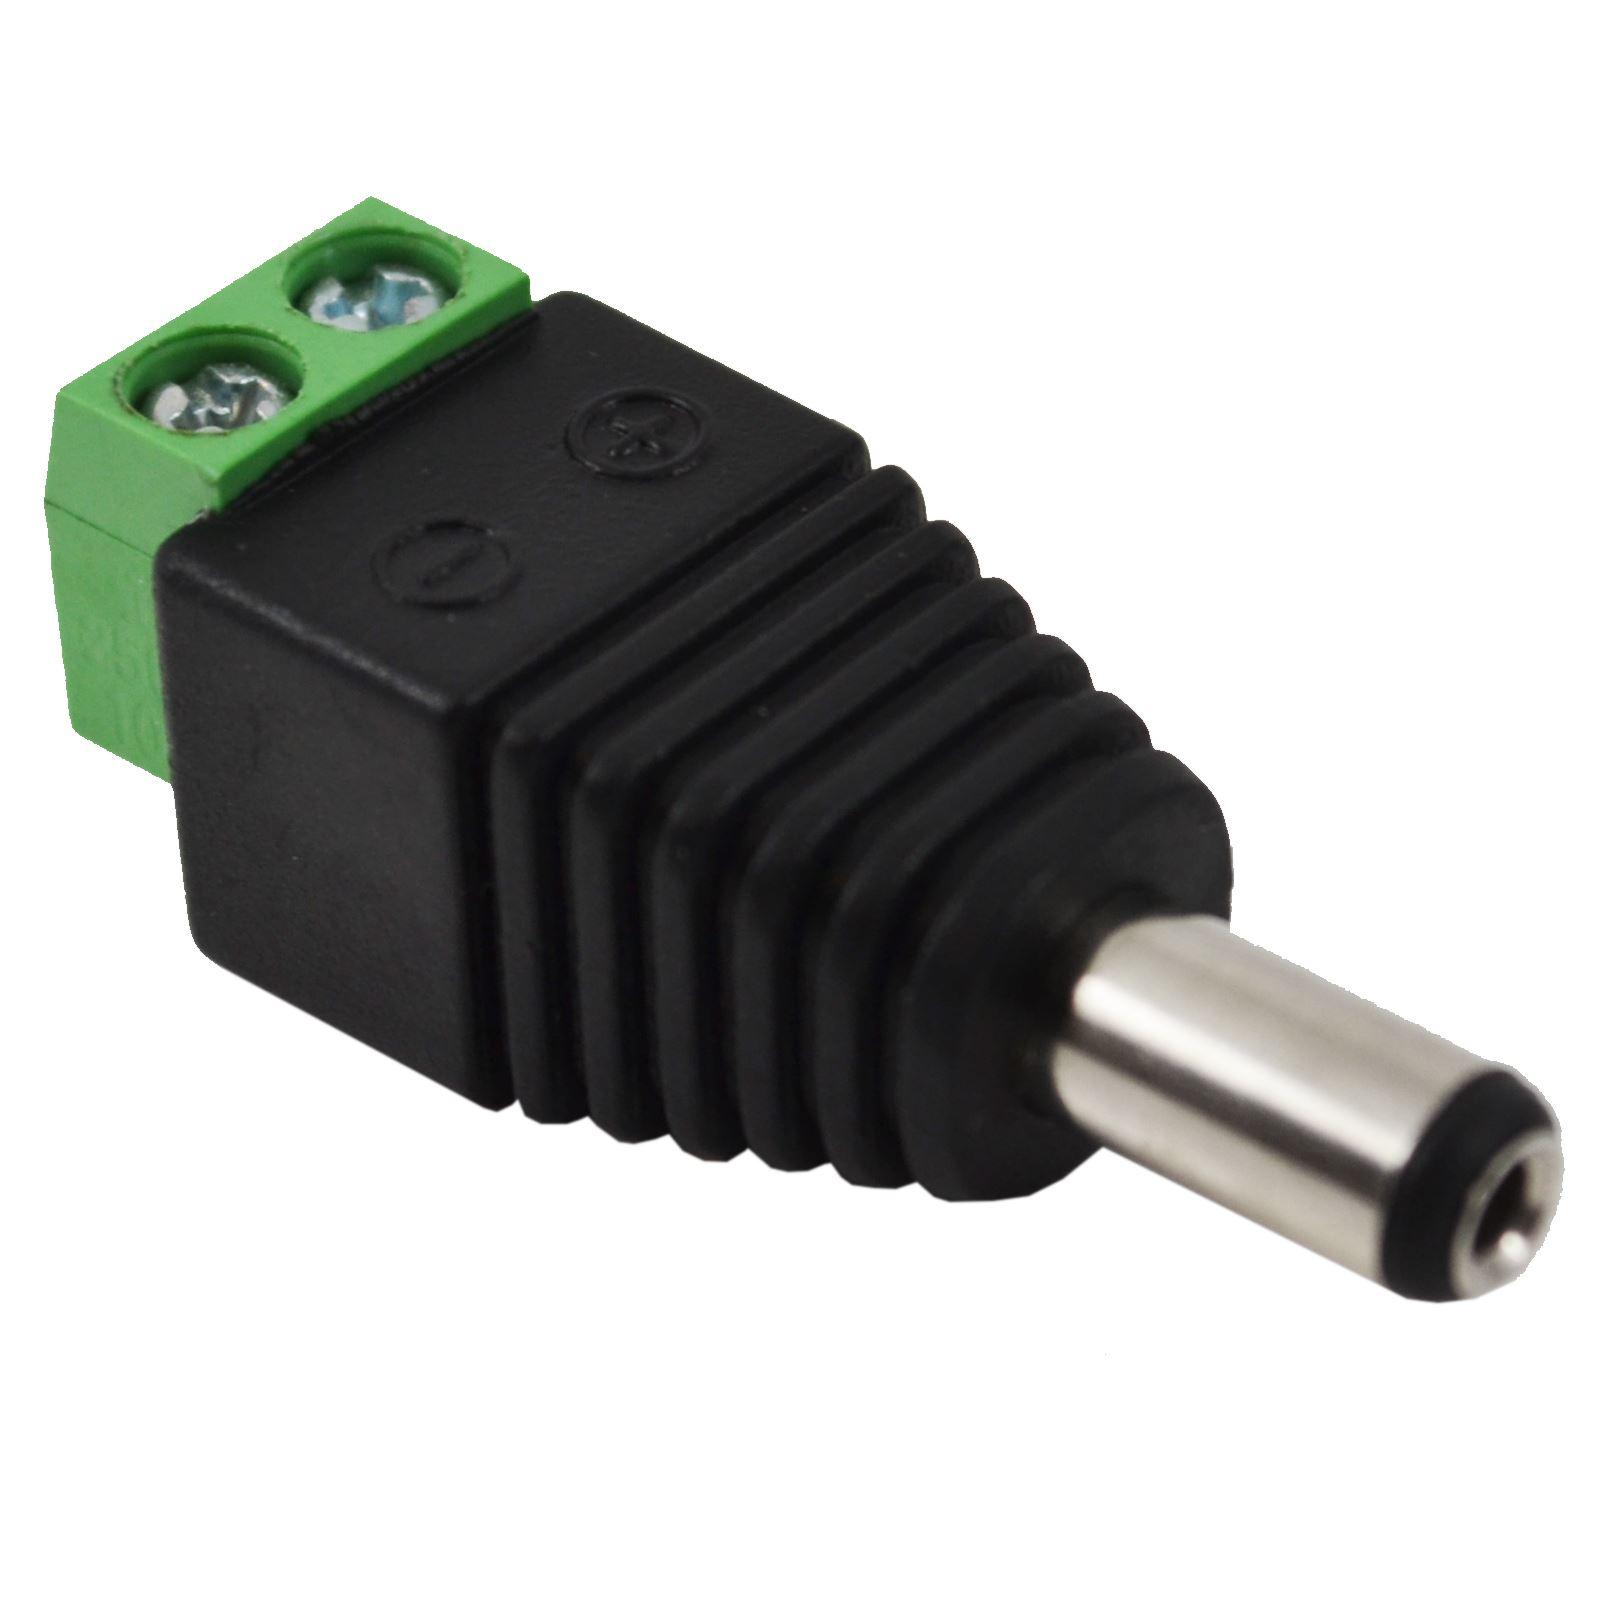 10 X 12v Dc Male Power Connector Adapter Plug Jack Socket